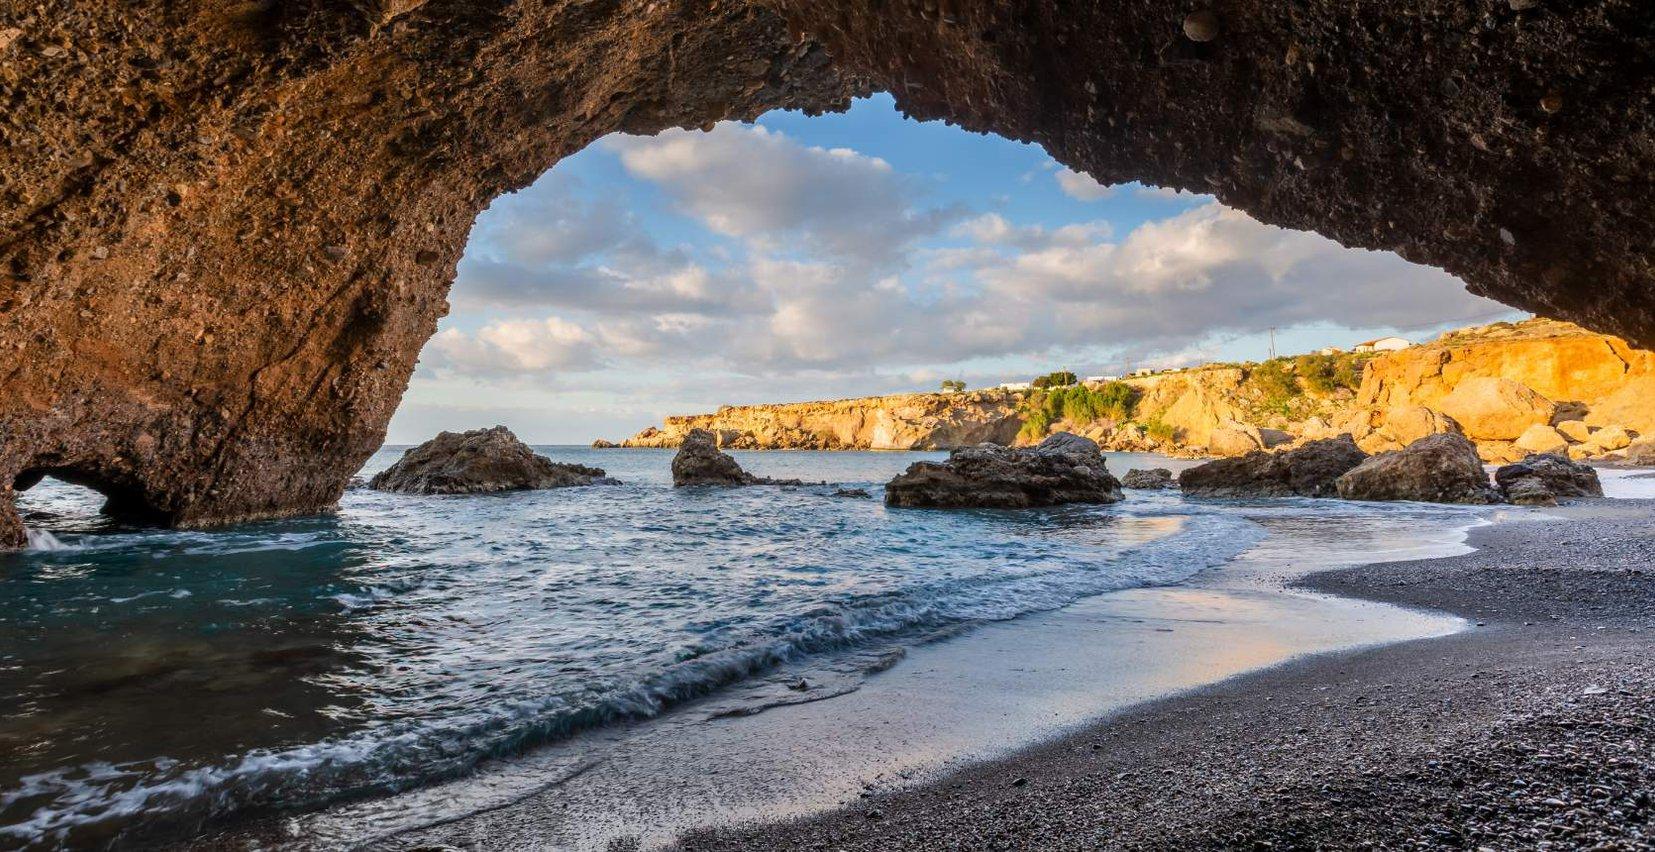 Glorious Kalo Nero beach near Mala Villa